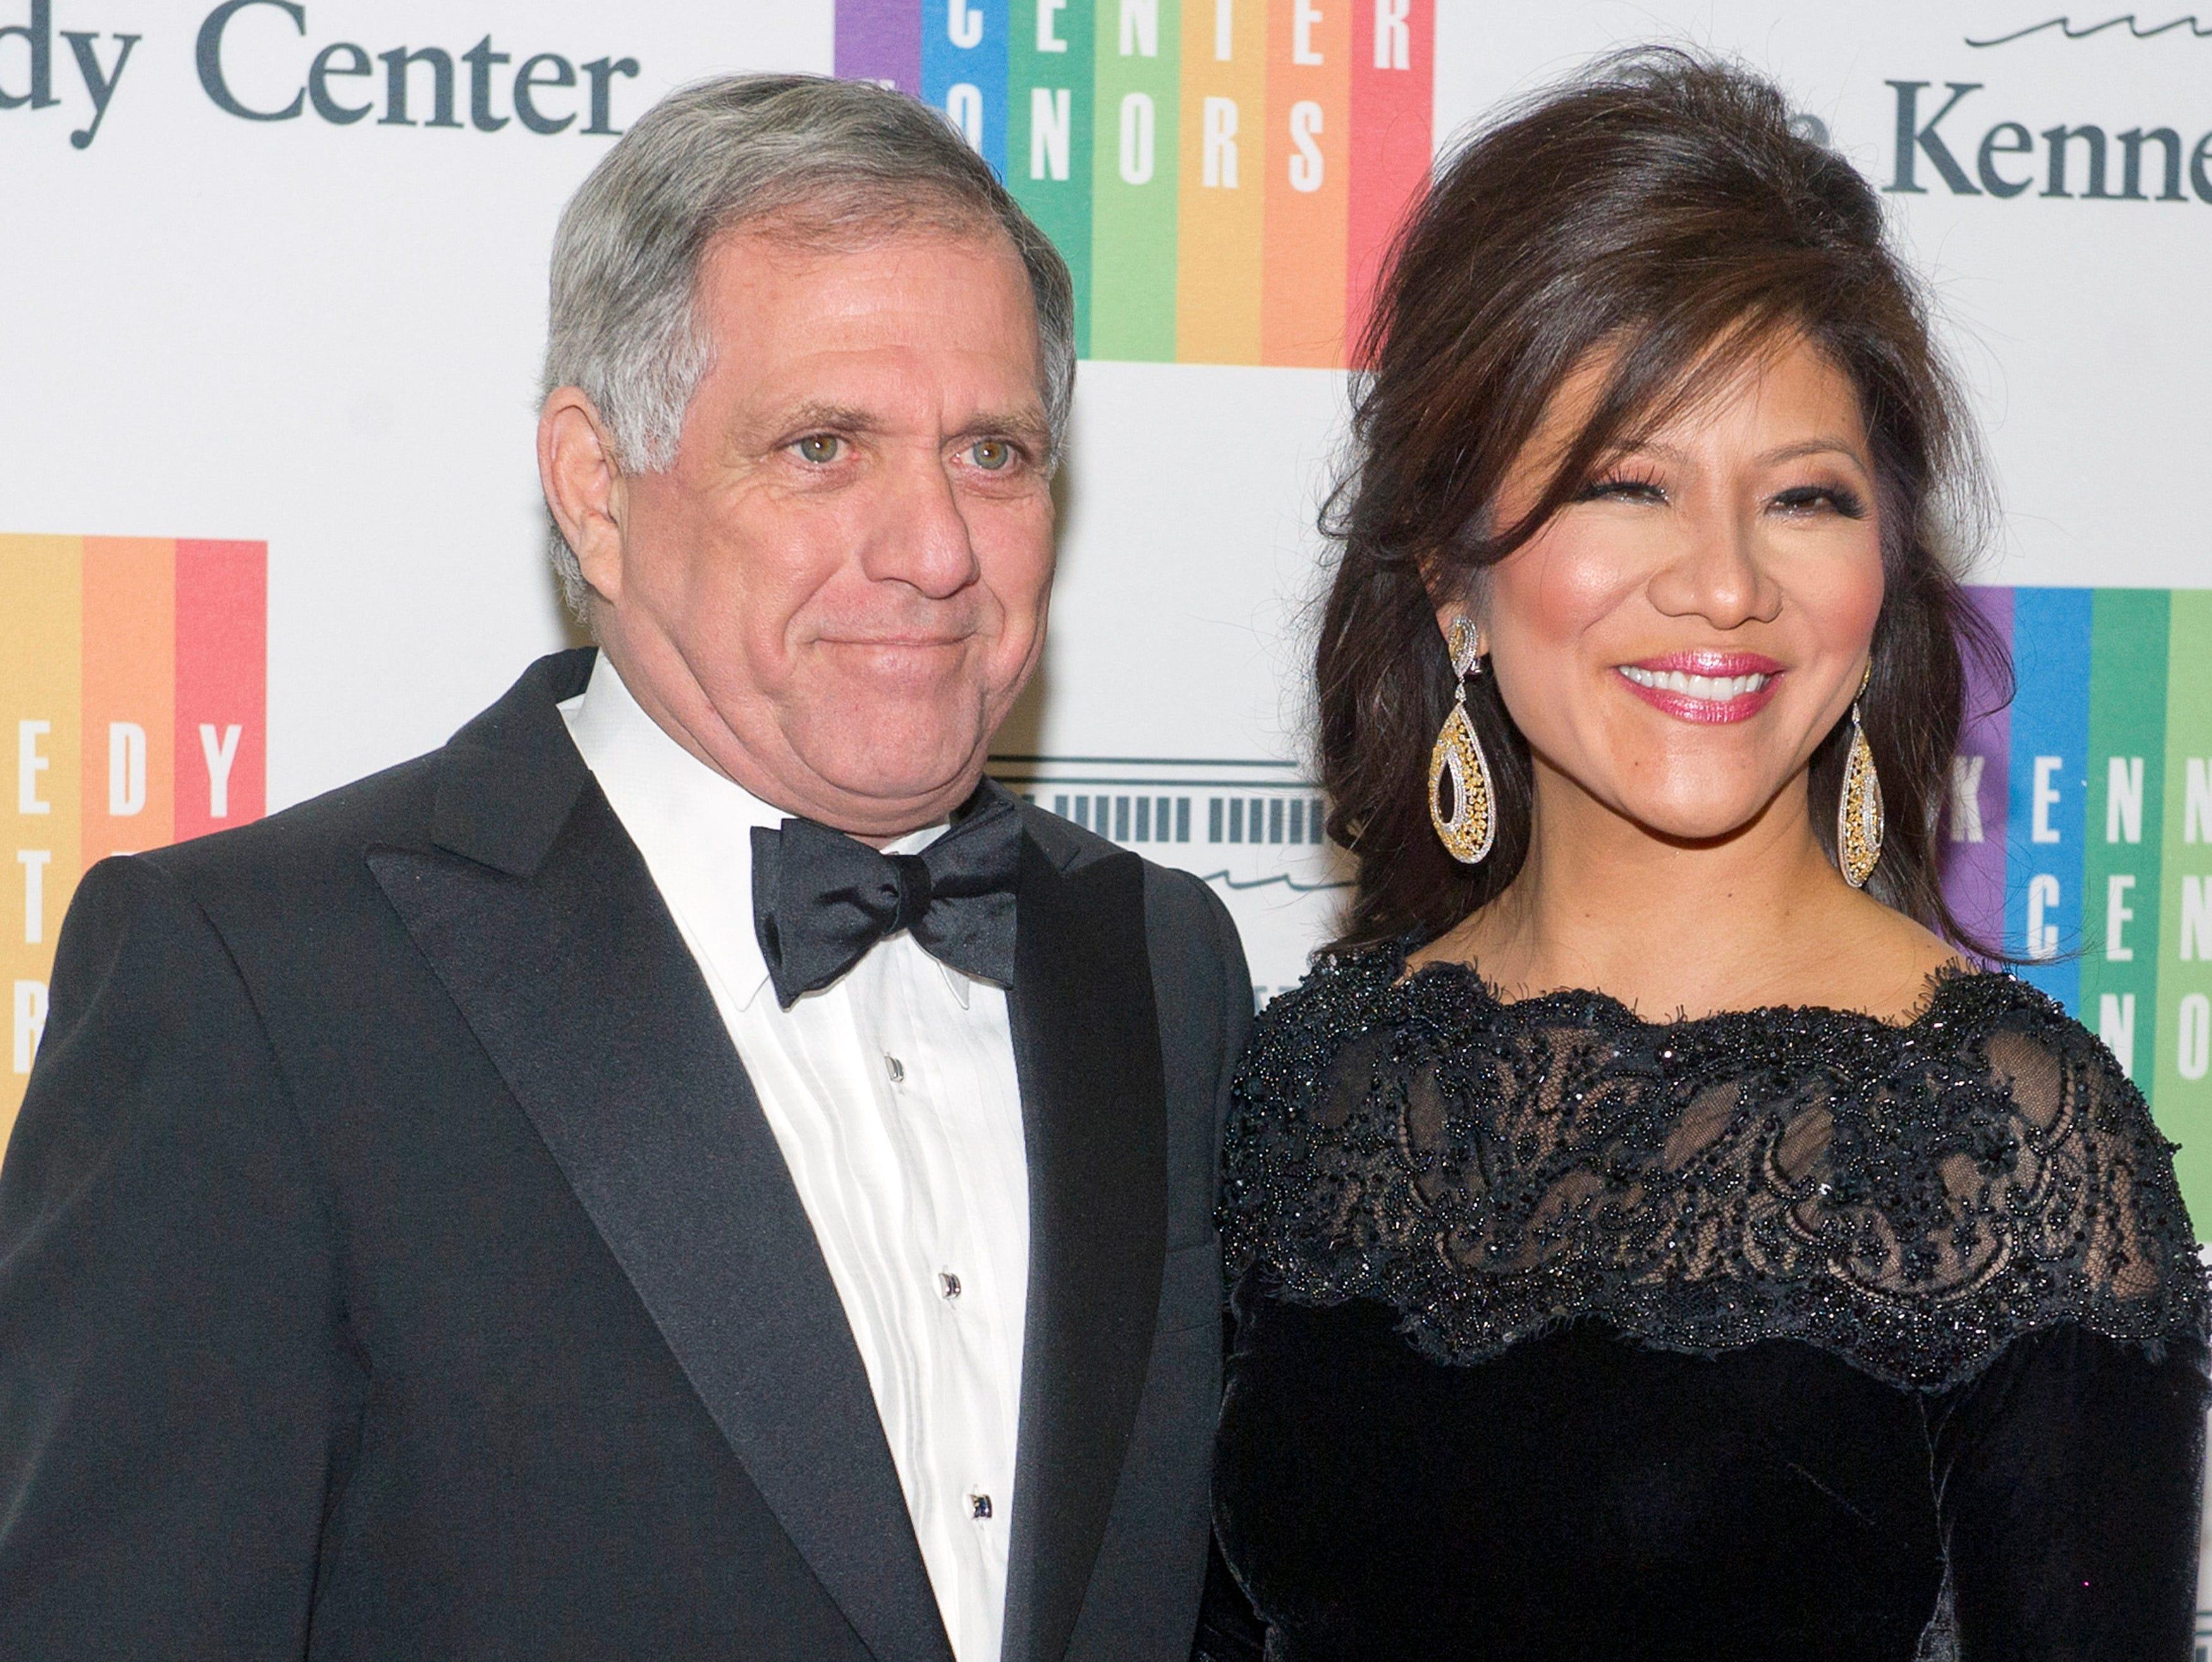 Julie Chen leaving CBS' 'The Talk' after her CEO husband Leslie Moonves' firing